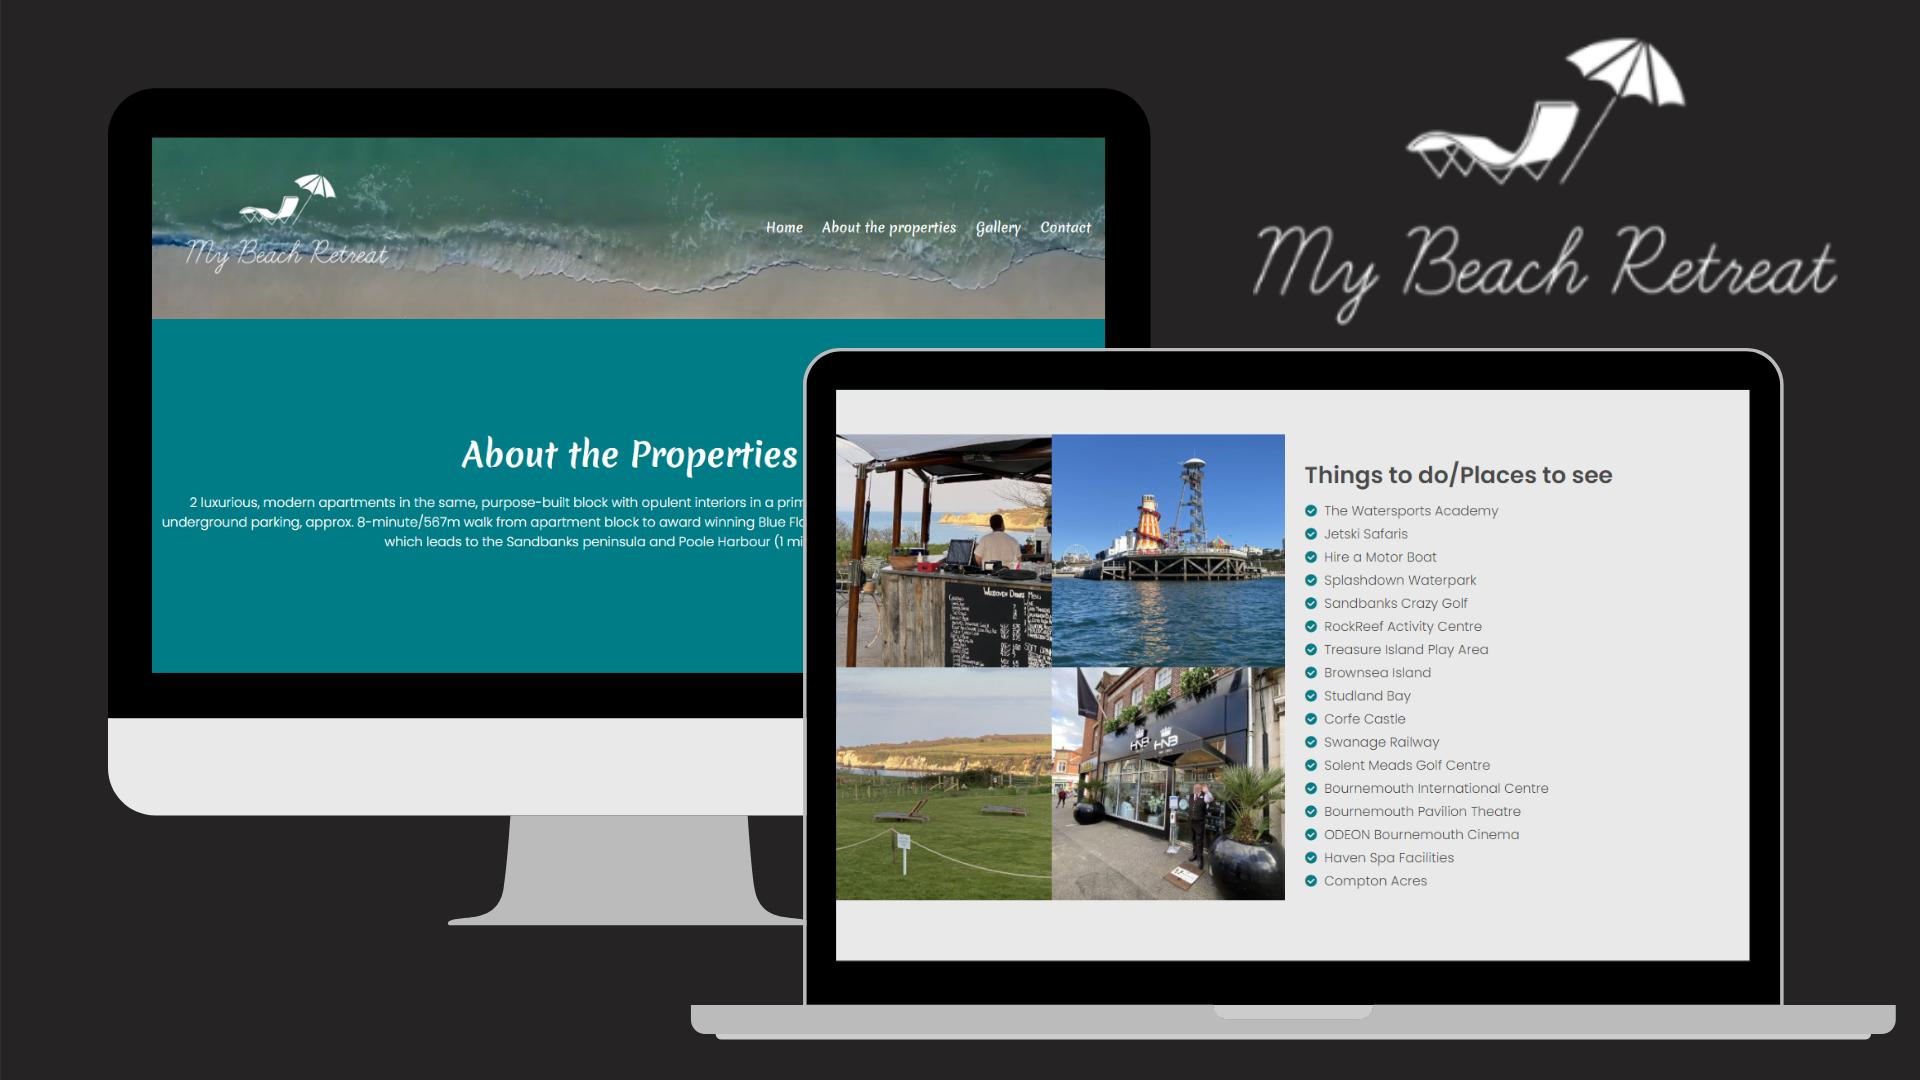 My Beach Retreat Website